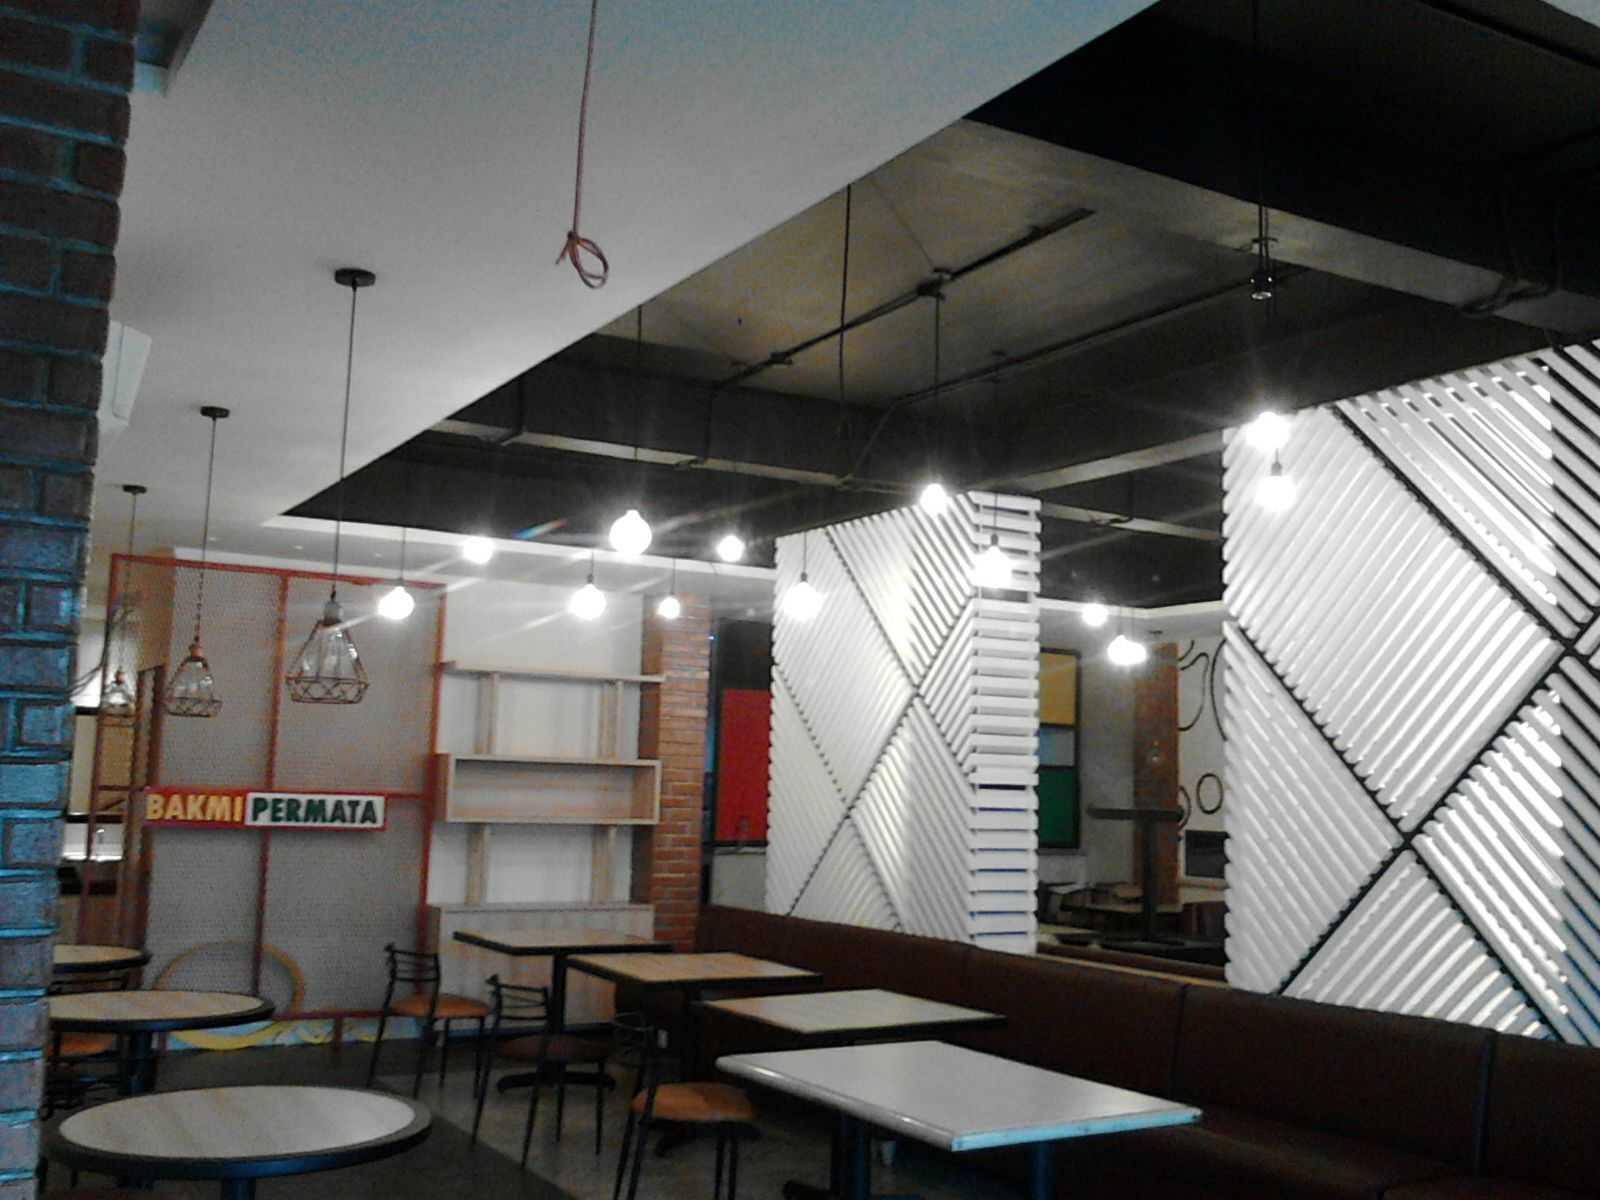 Meili Darmasetiawan Bakmi Permata Kebon Jeruk Kebon Jeruk Jakarta Kebon Jeruk Jakarta Dining Area Industrial  12799